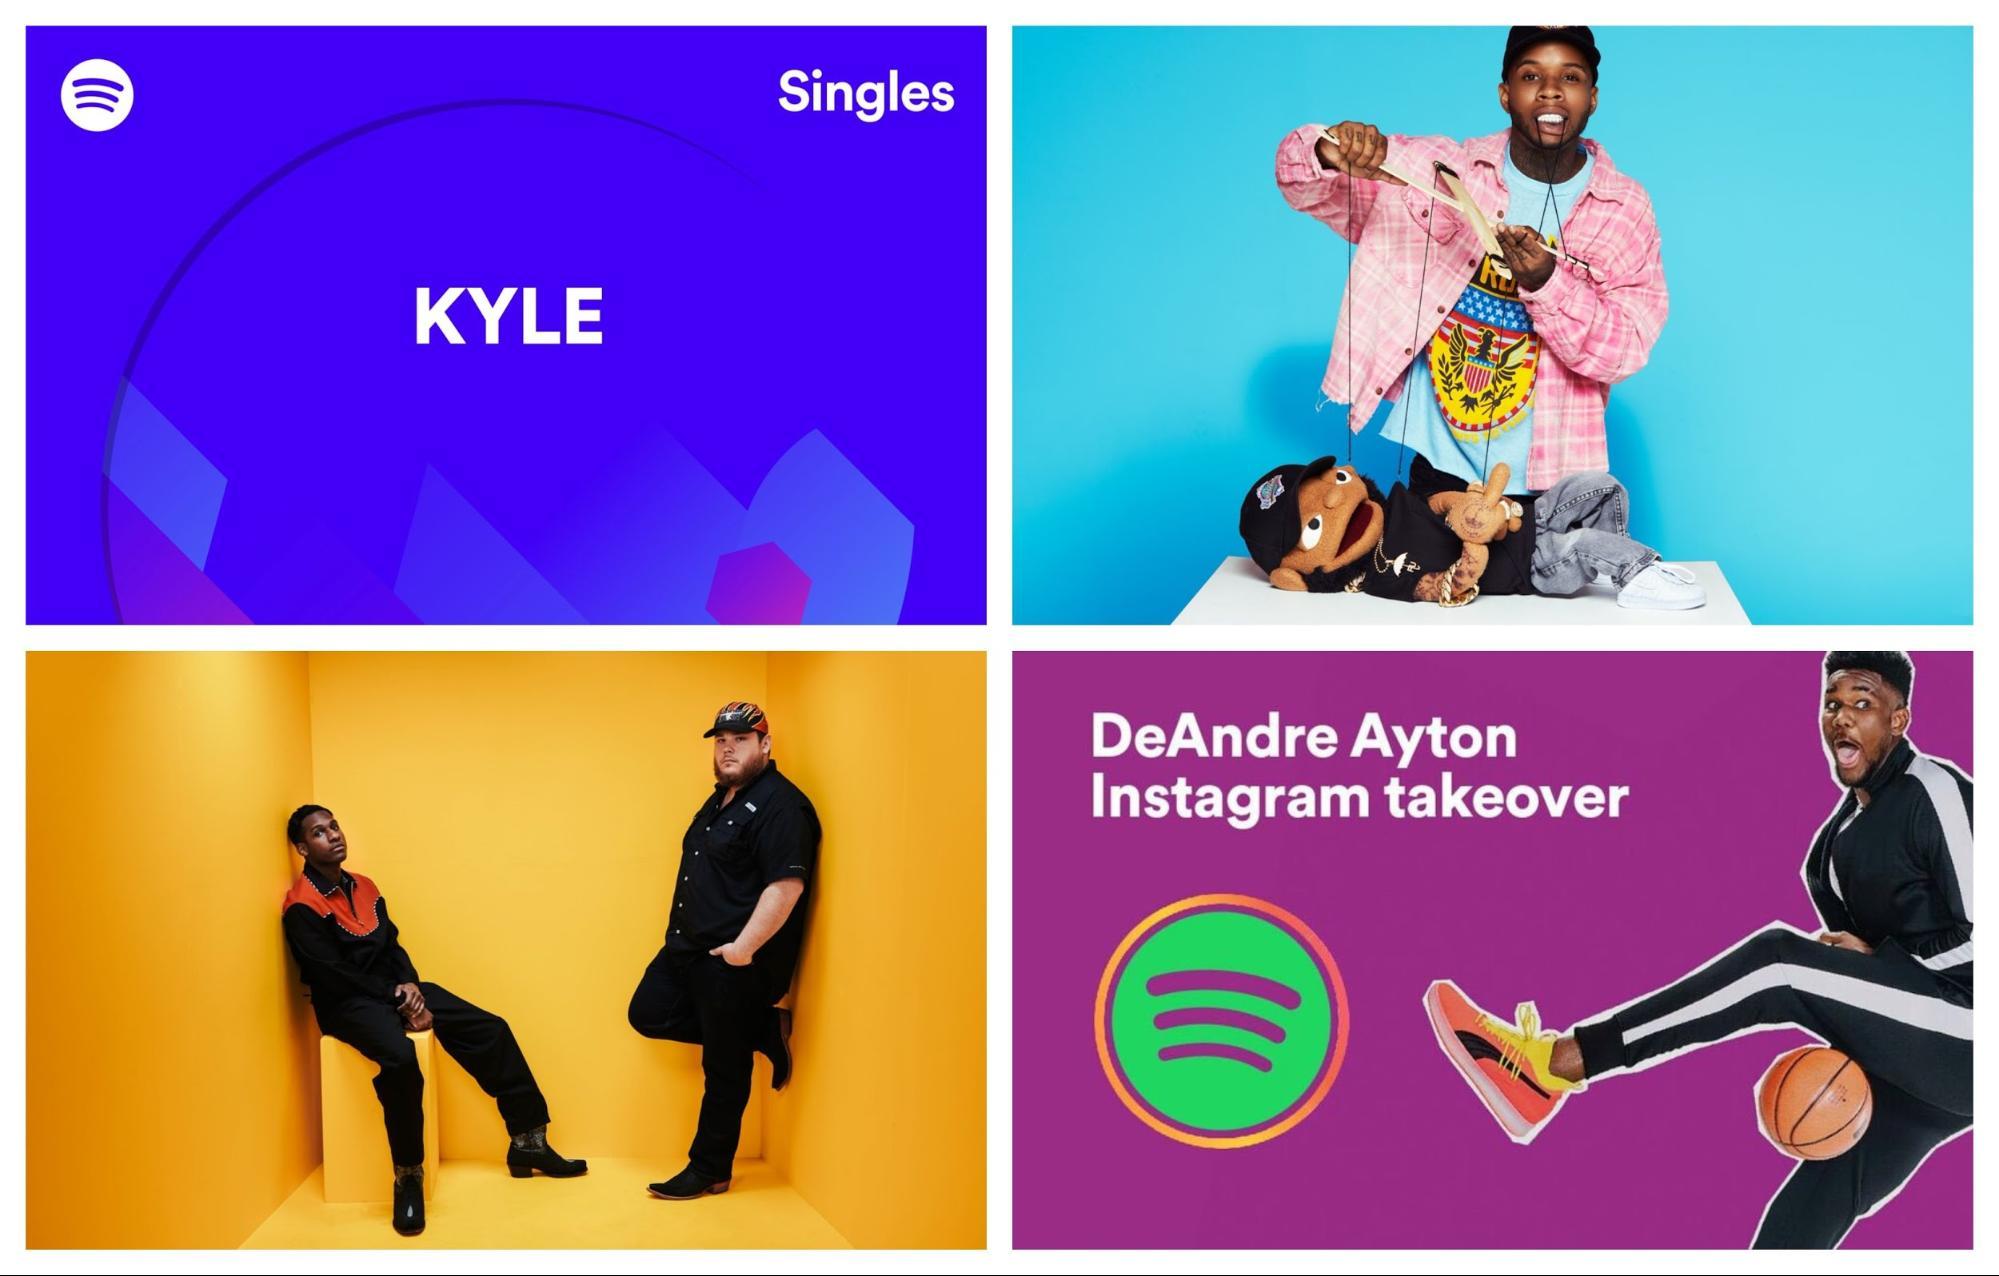 Imagen 001 Spotify tendencias diseno grafico 2019